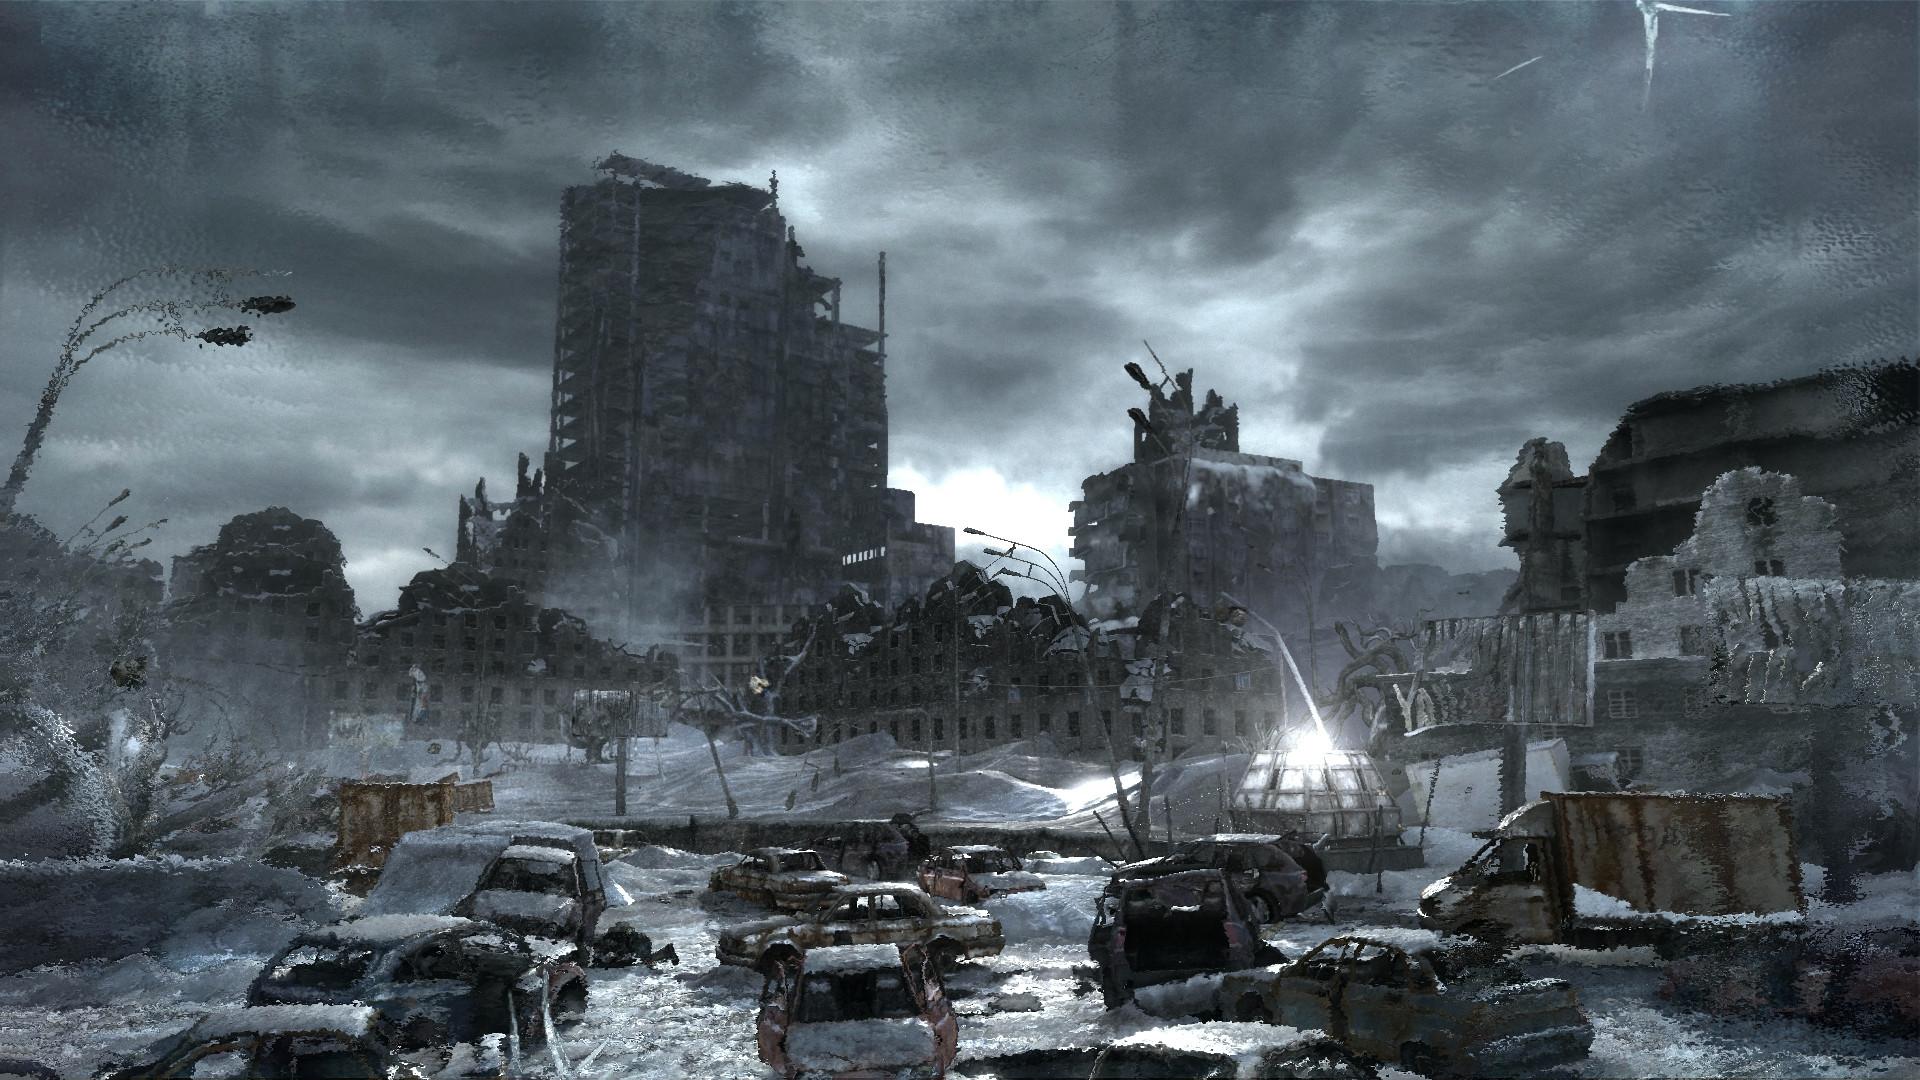 frozen apocalypse city   Stalker and Metro   Pinterest   Apocalypse, Post  apocalyptic and Post apocalypse